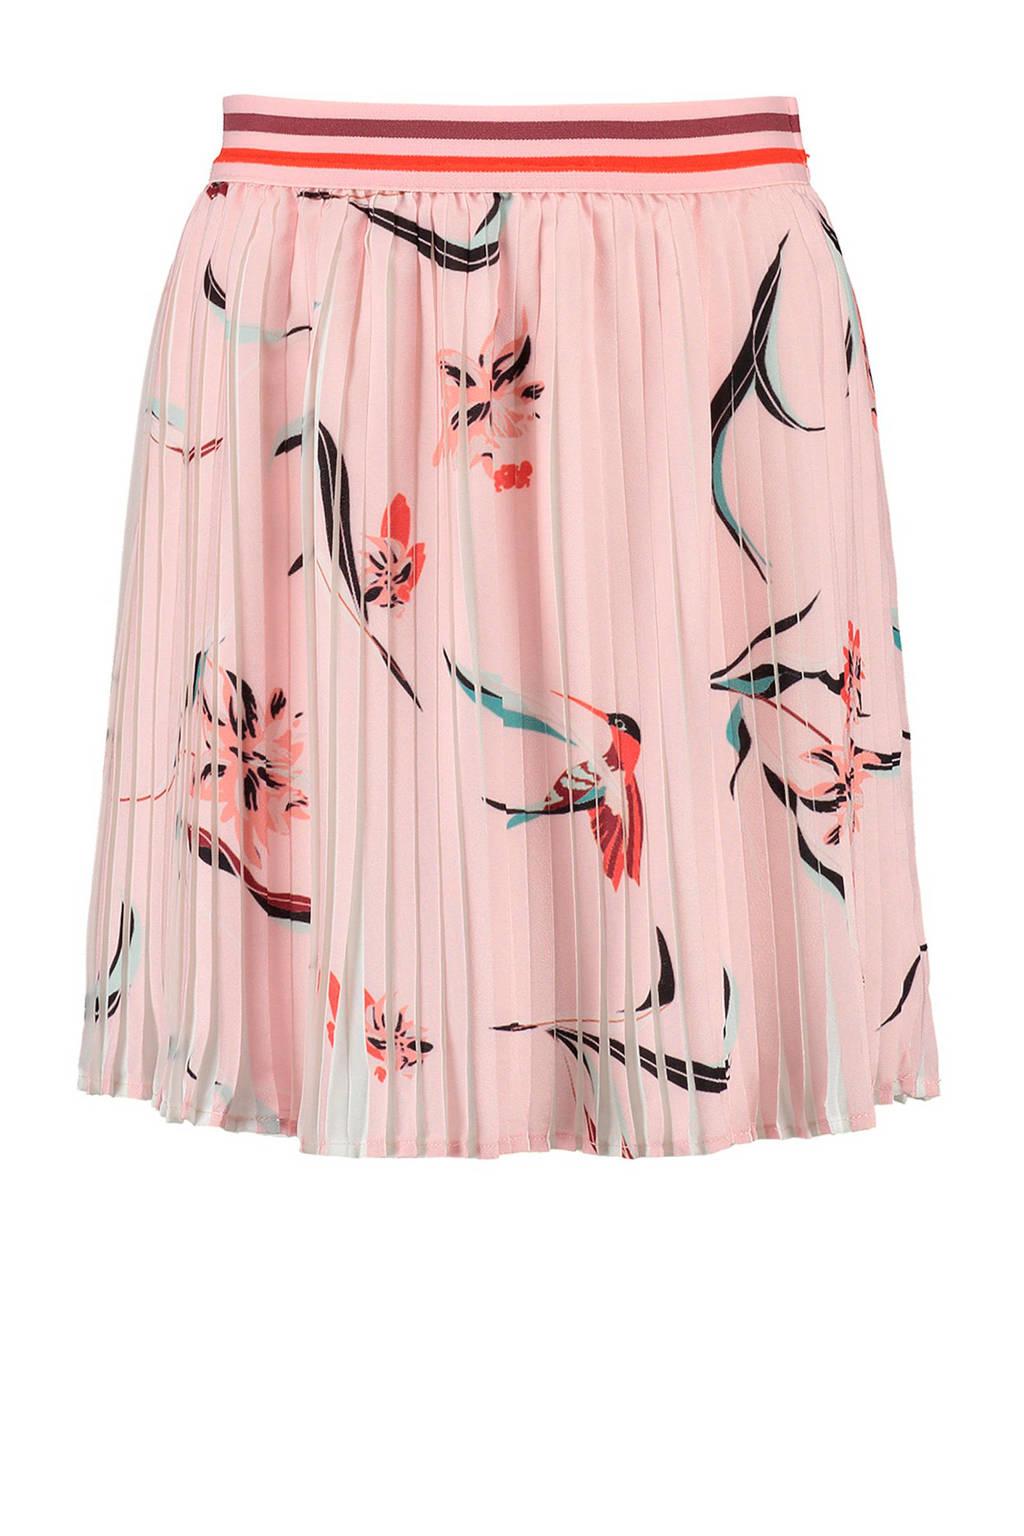 CKS KIDS plissérok Gwenael met vogels roze, Lichtroze